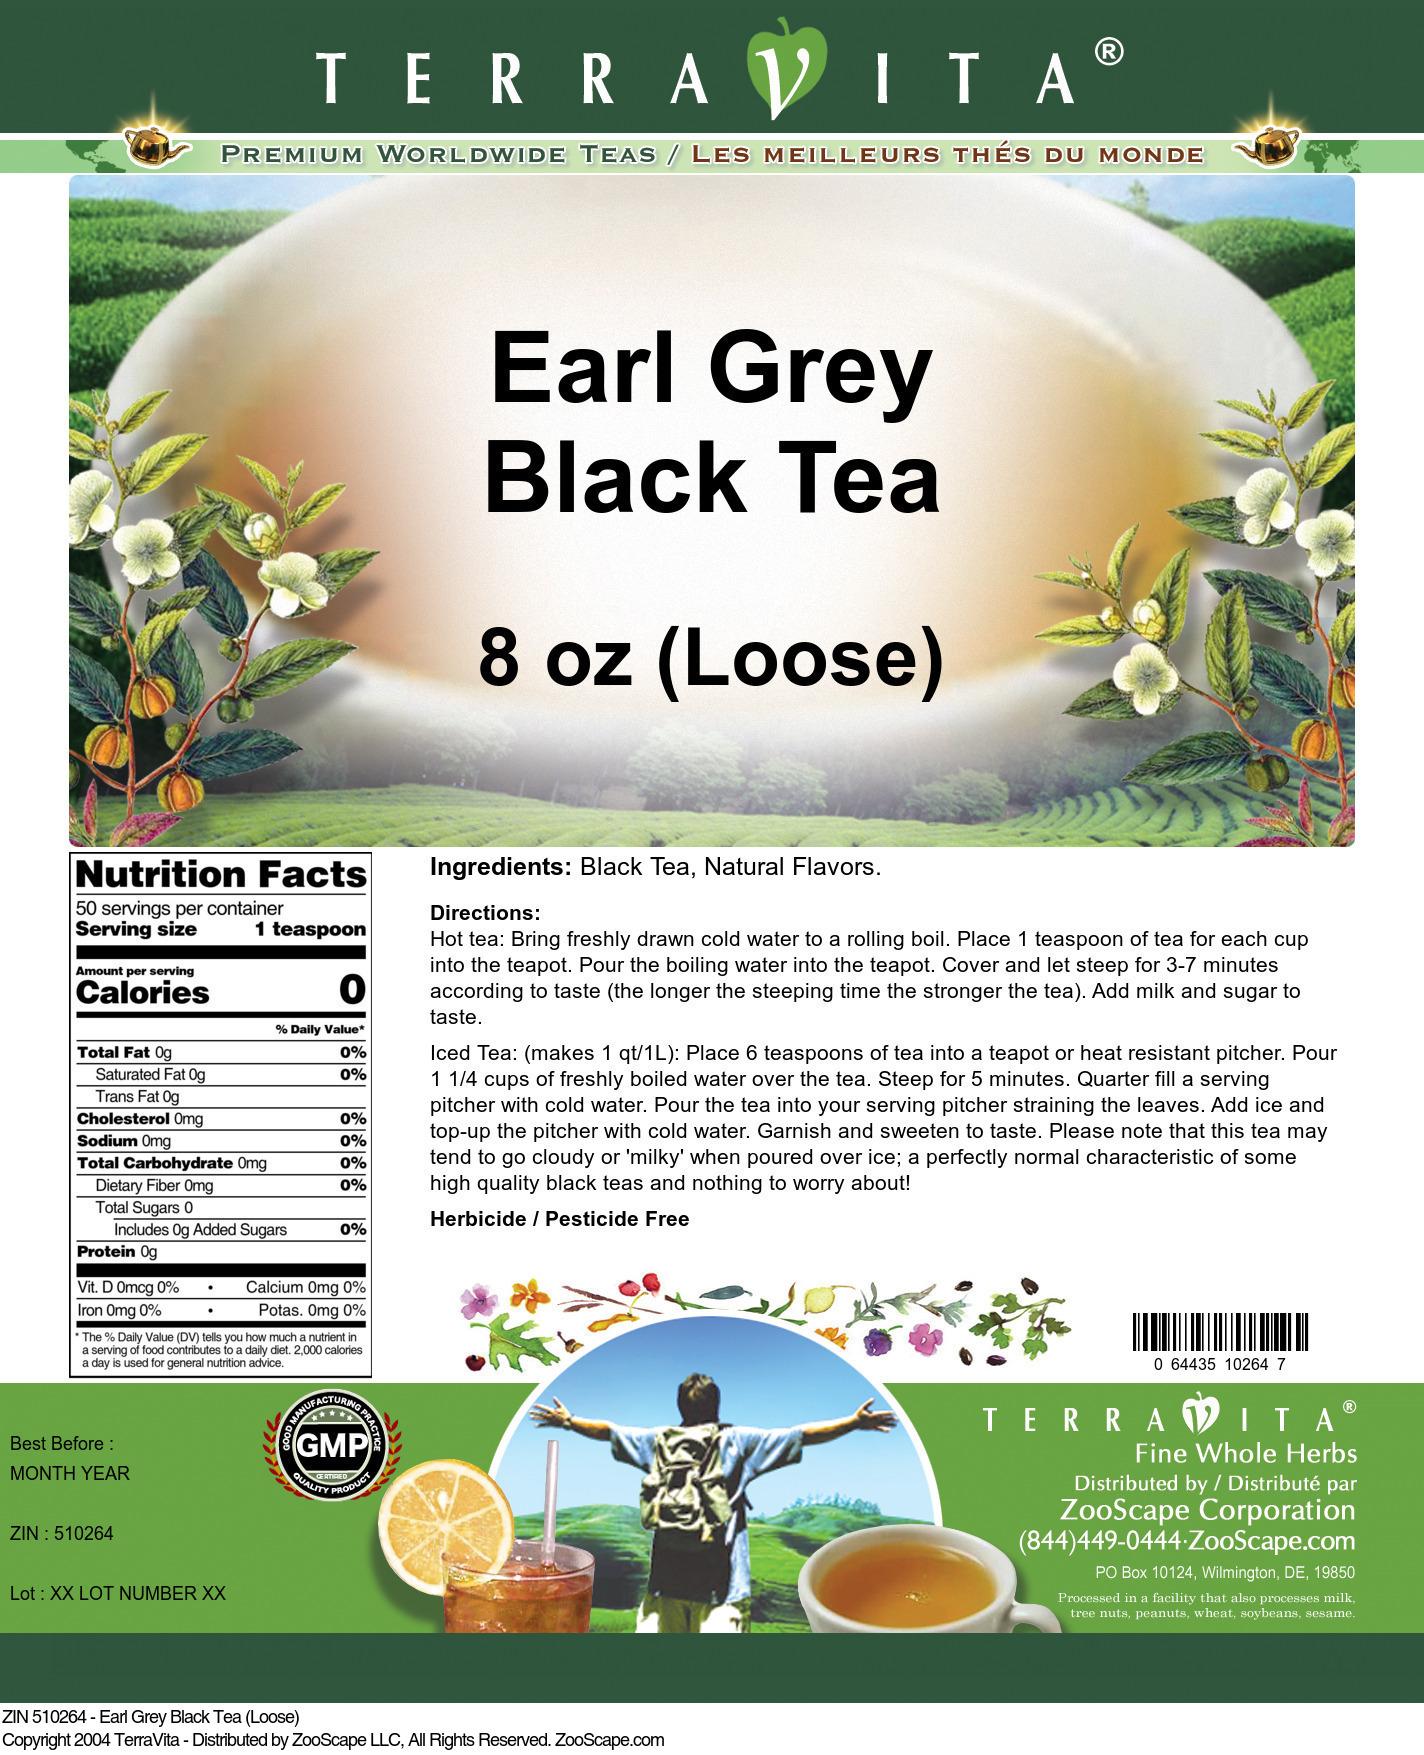 Earl Grey Black Tea (Loose)